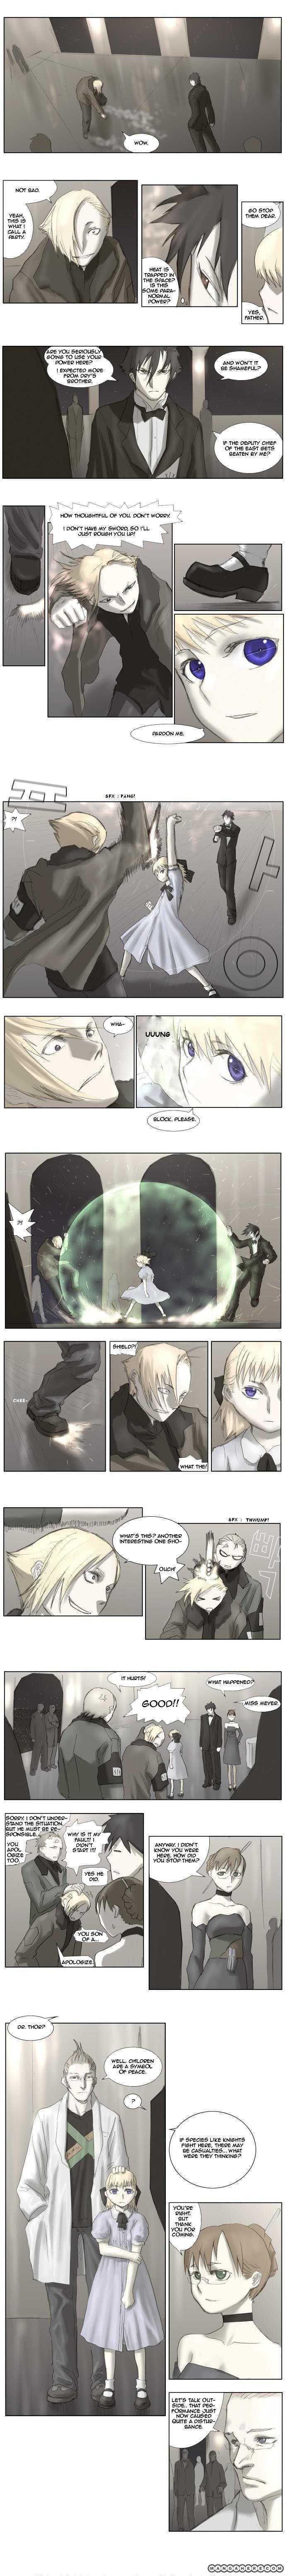 Knight Run 9 Page 2